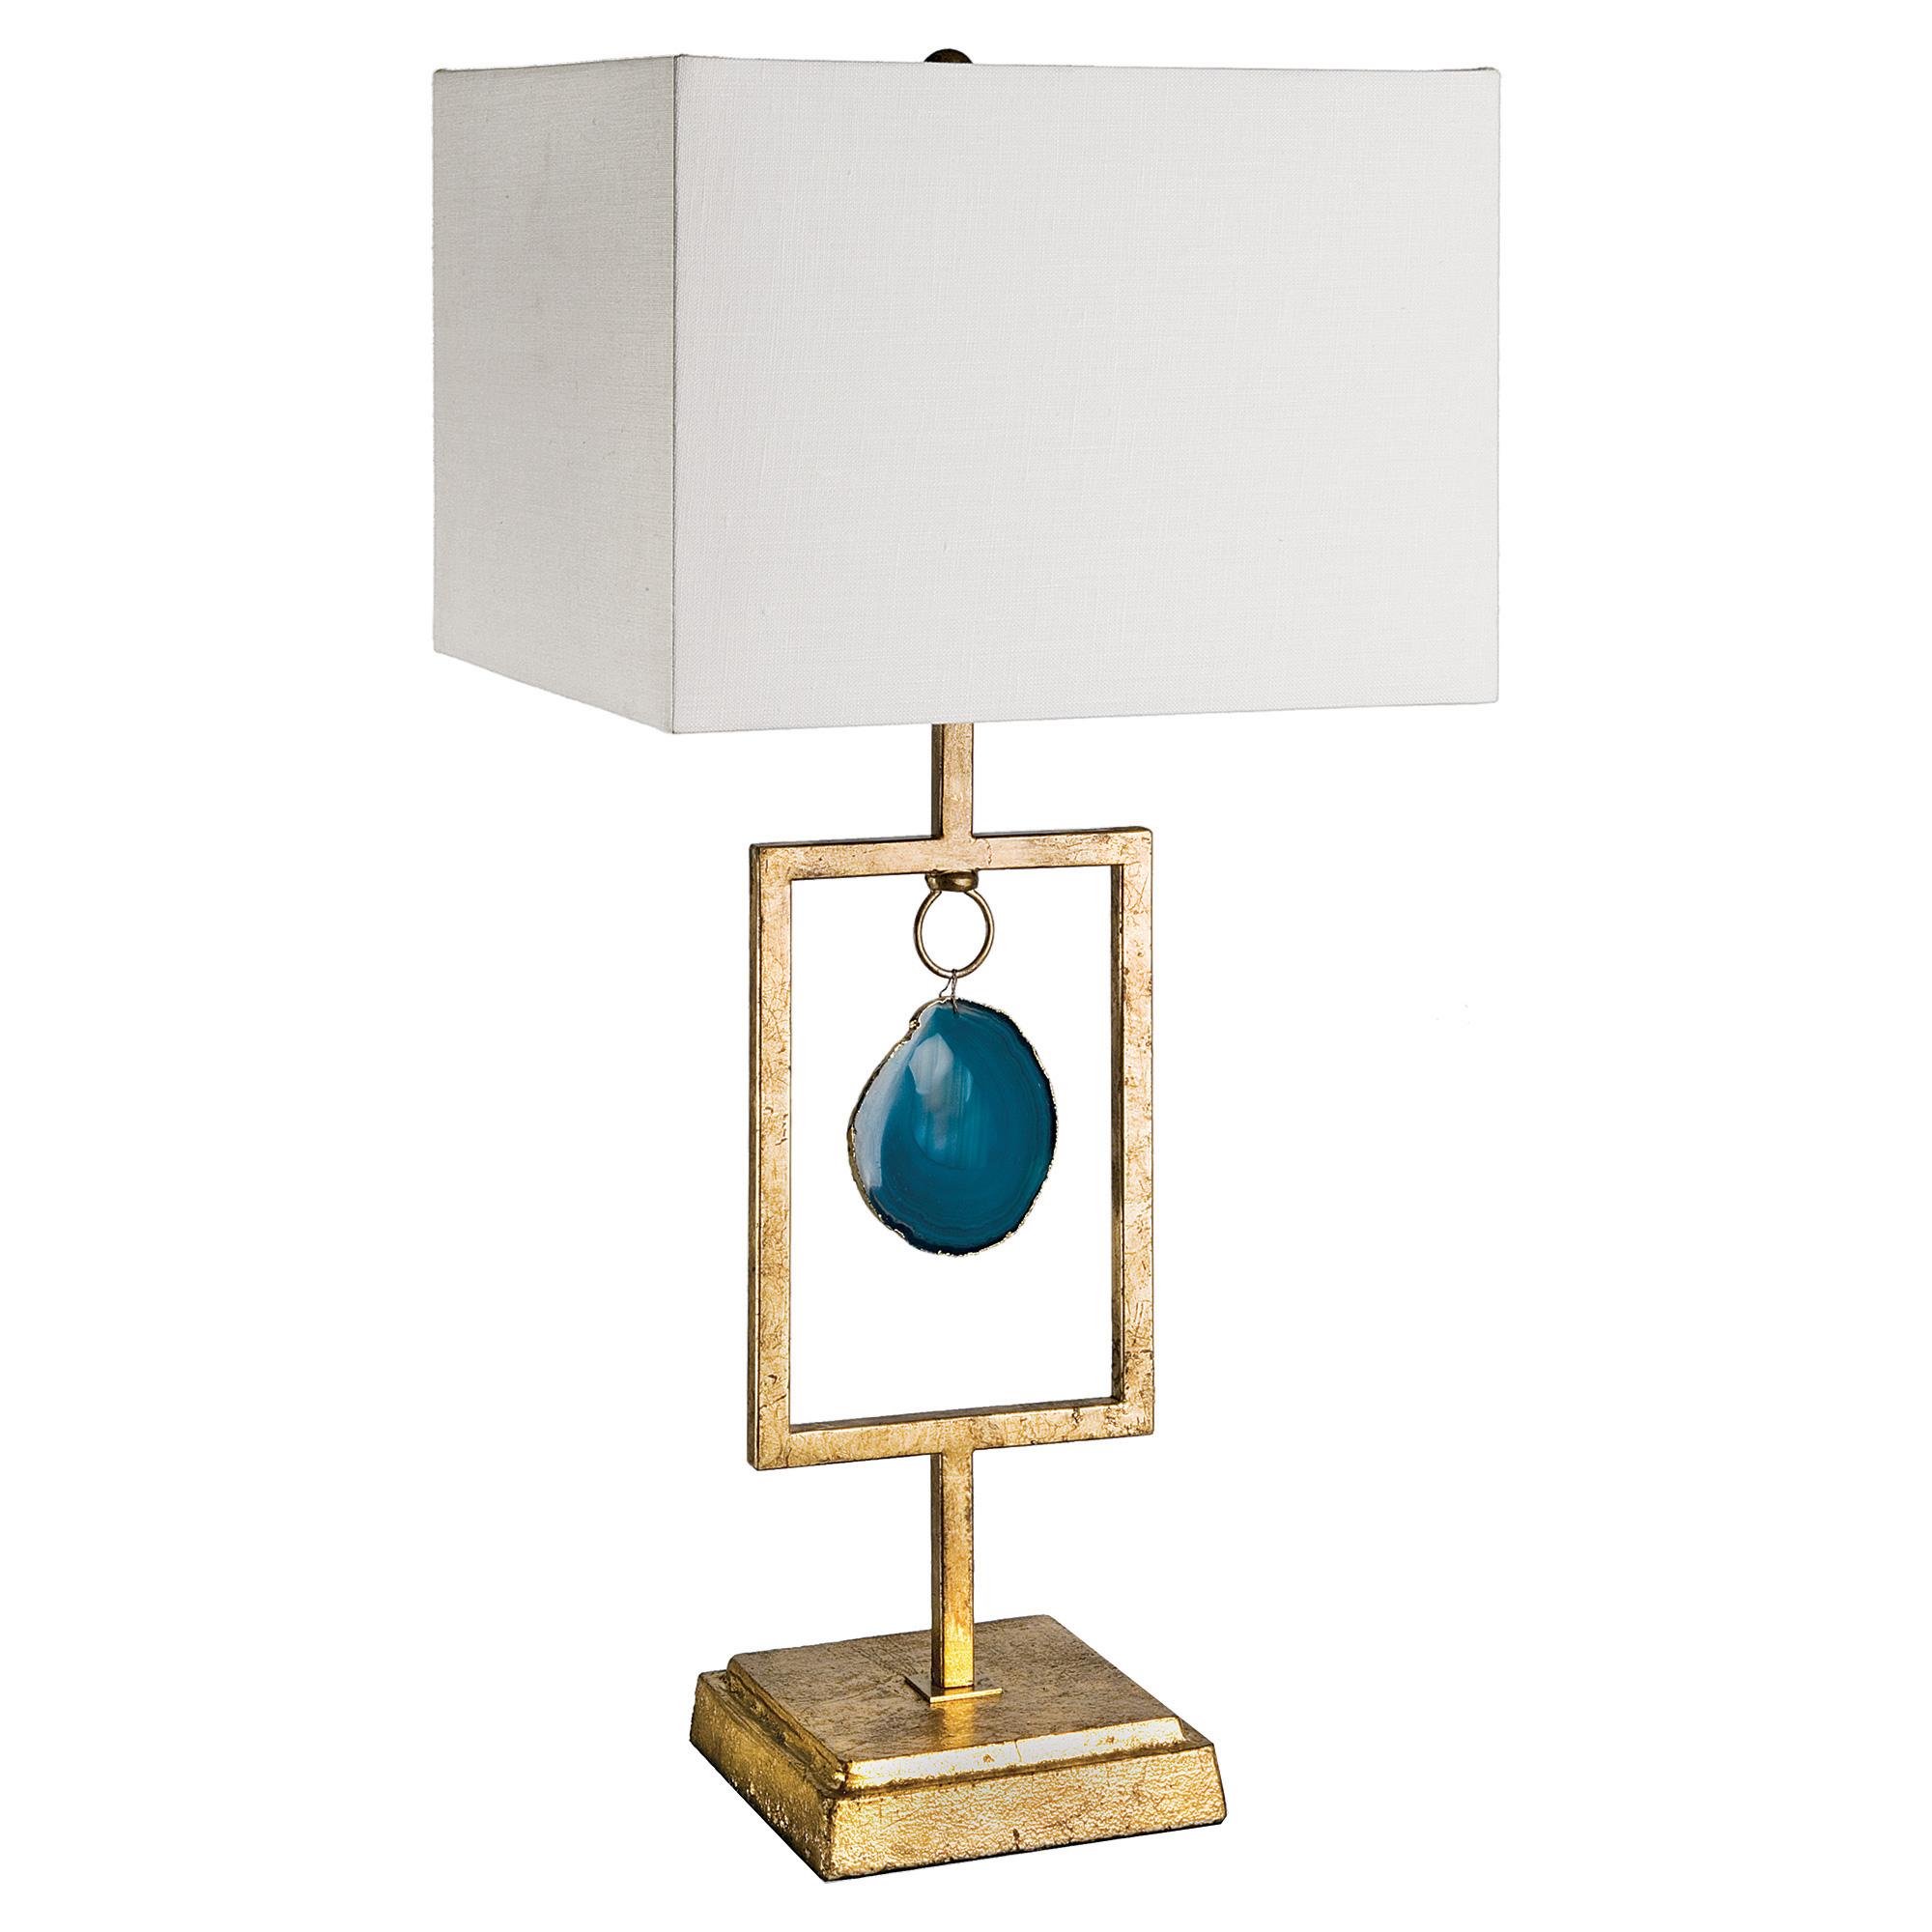 Alegra Global Bazaar Antique Gold Teal Agate Lamp